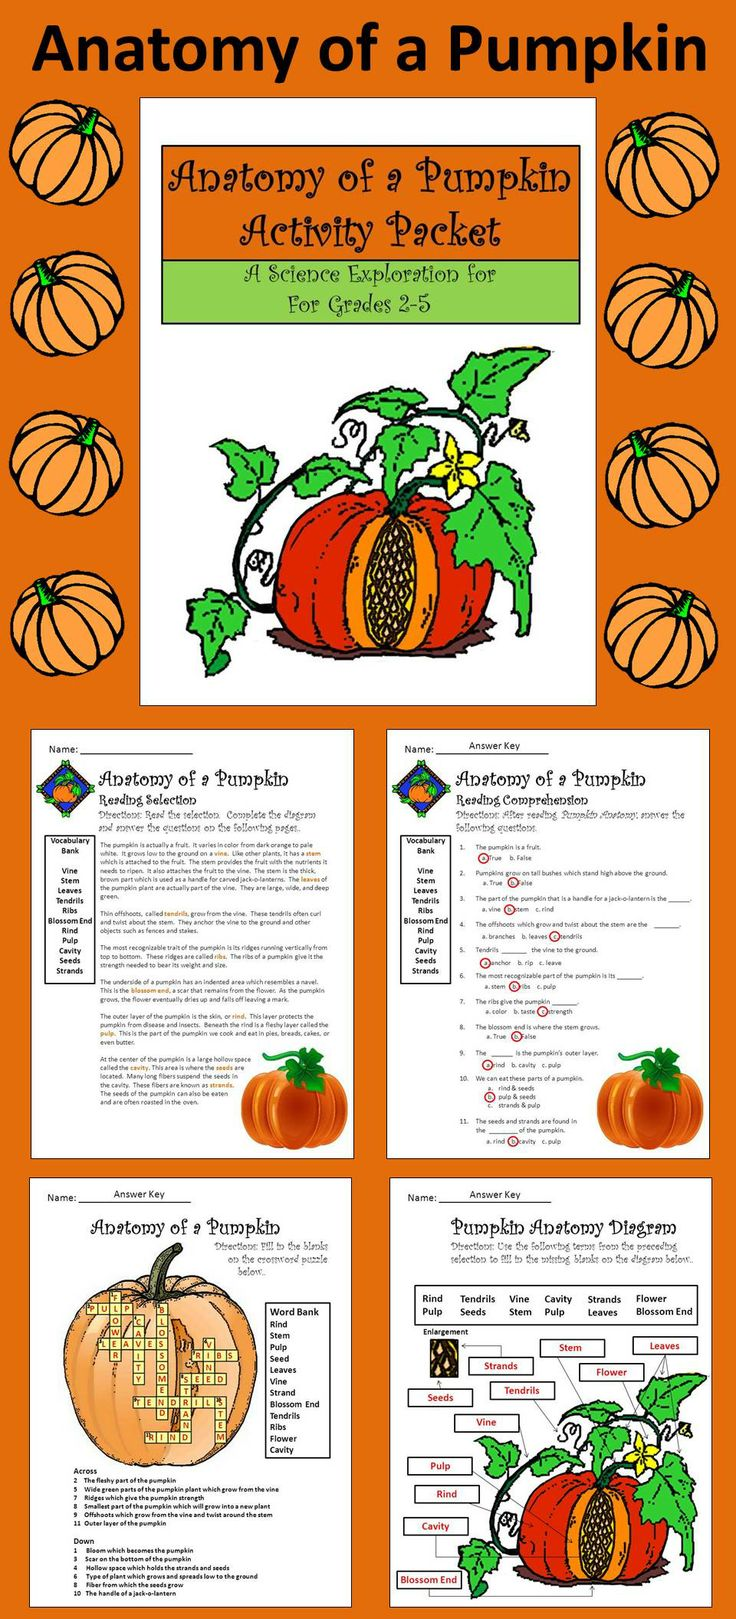 ... Plural Worksheet | Free Download Printable Worksheets On Jkw4p.com